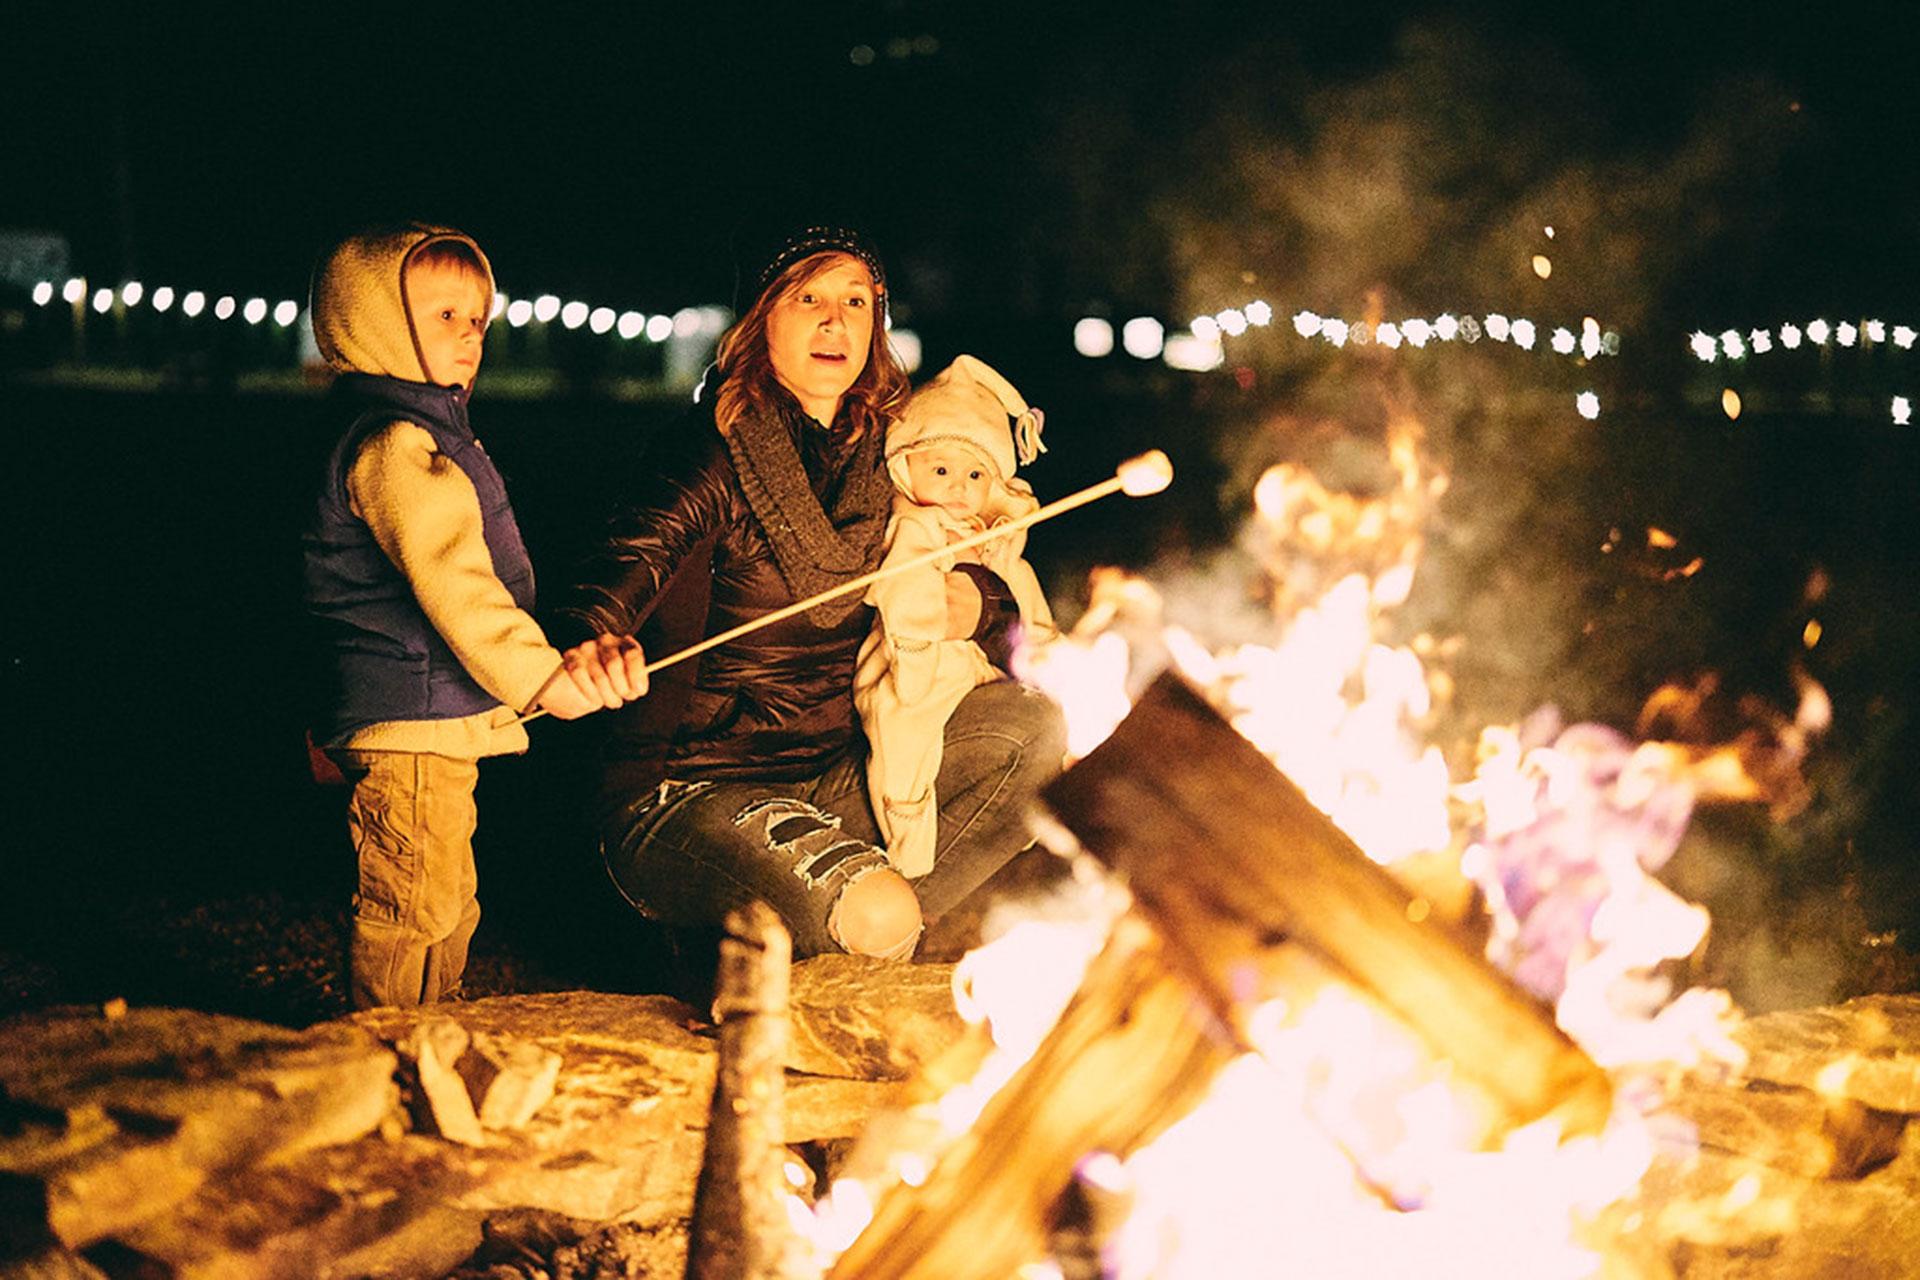 Family Roasting S'mores at JuneBug Retro Resort in North Carolina